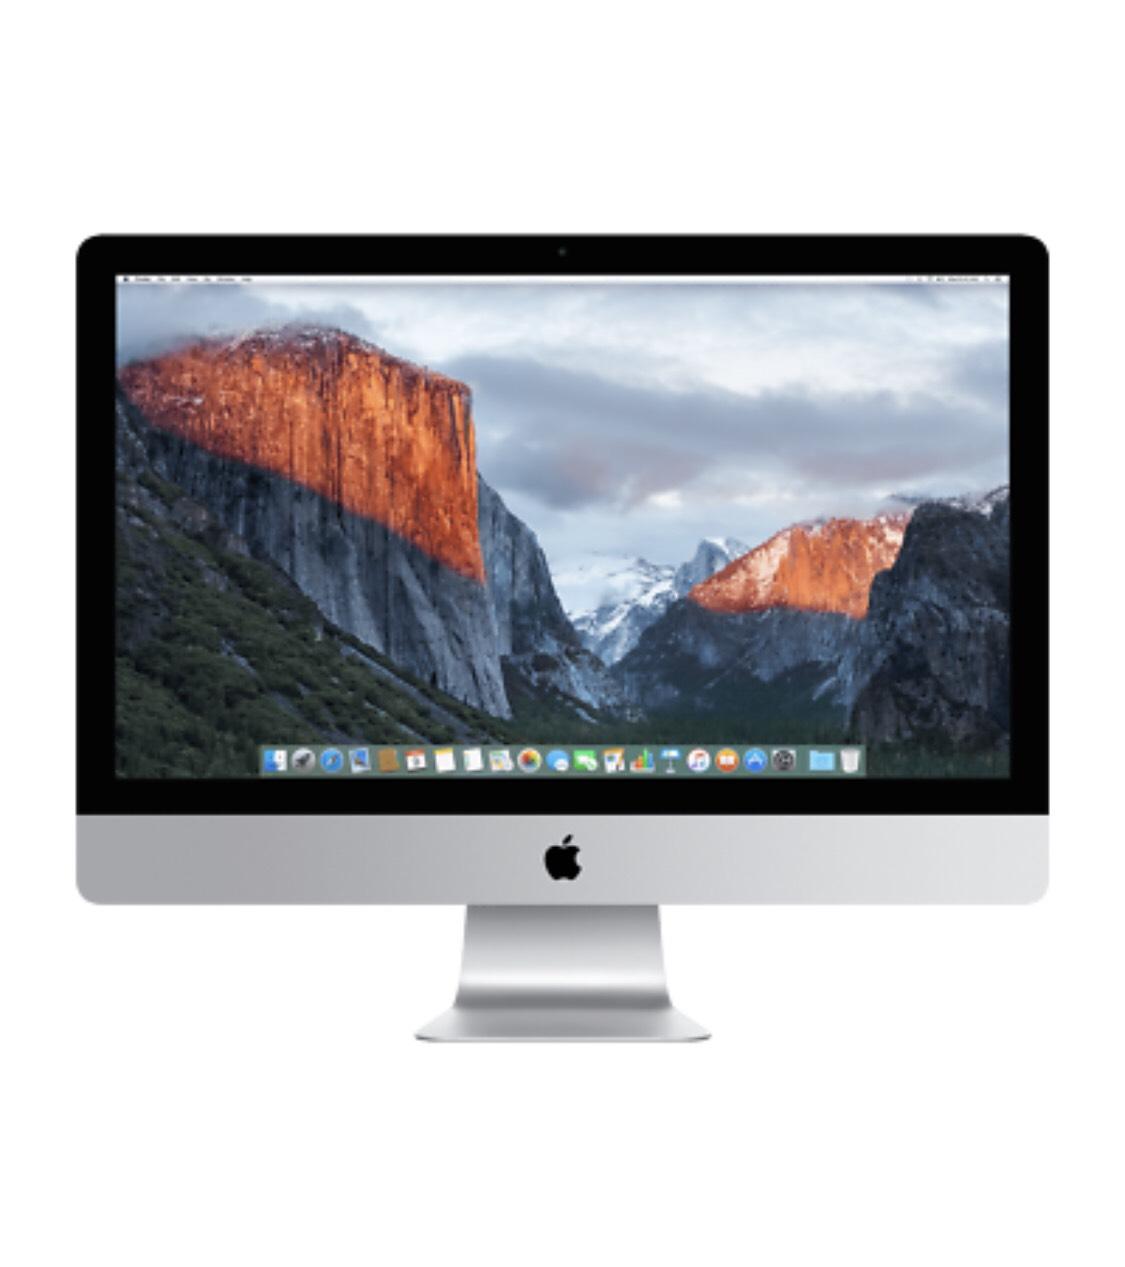 "Apple iMac 27"" mid 2010 (Intel i5 4x2.8Ghz / 8GB RAM / 1TB)"